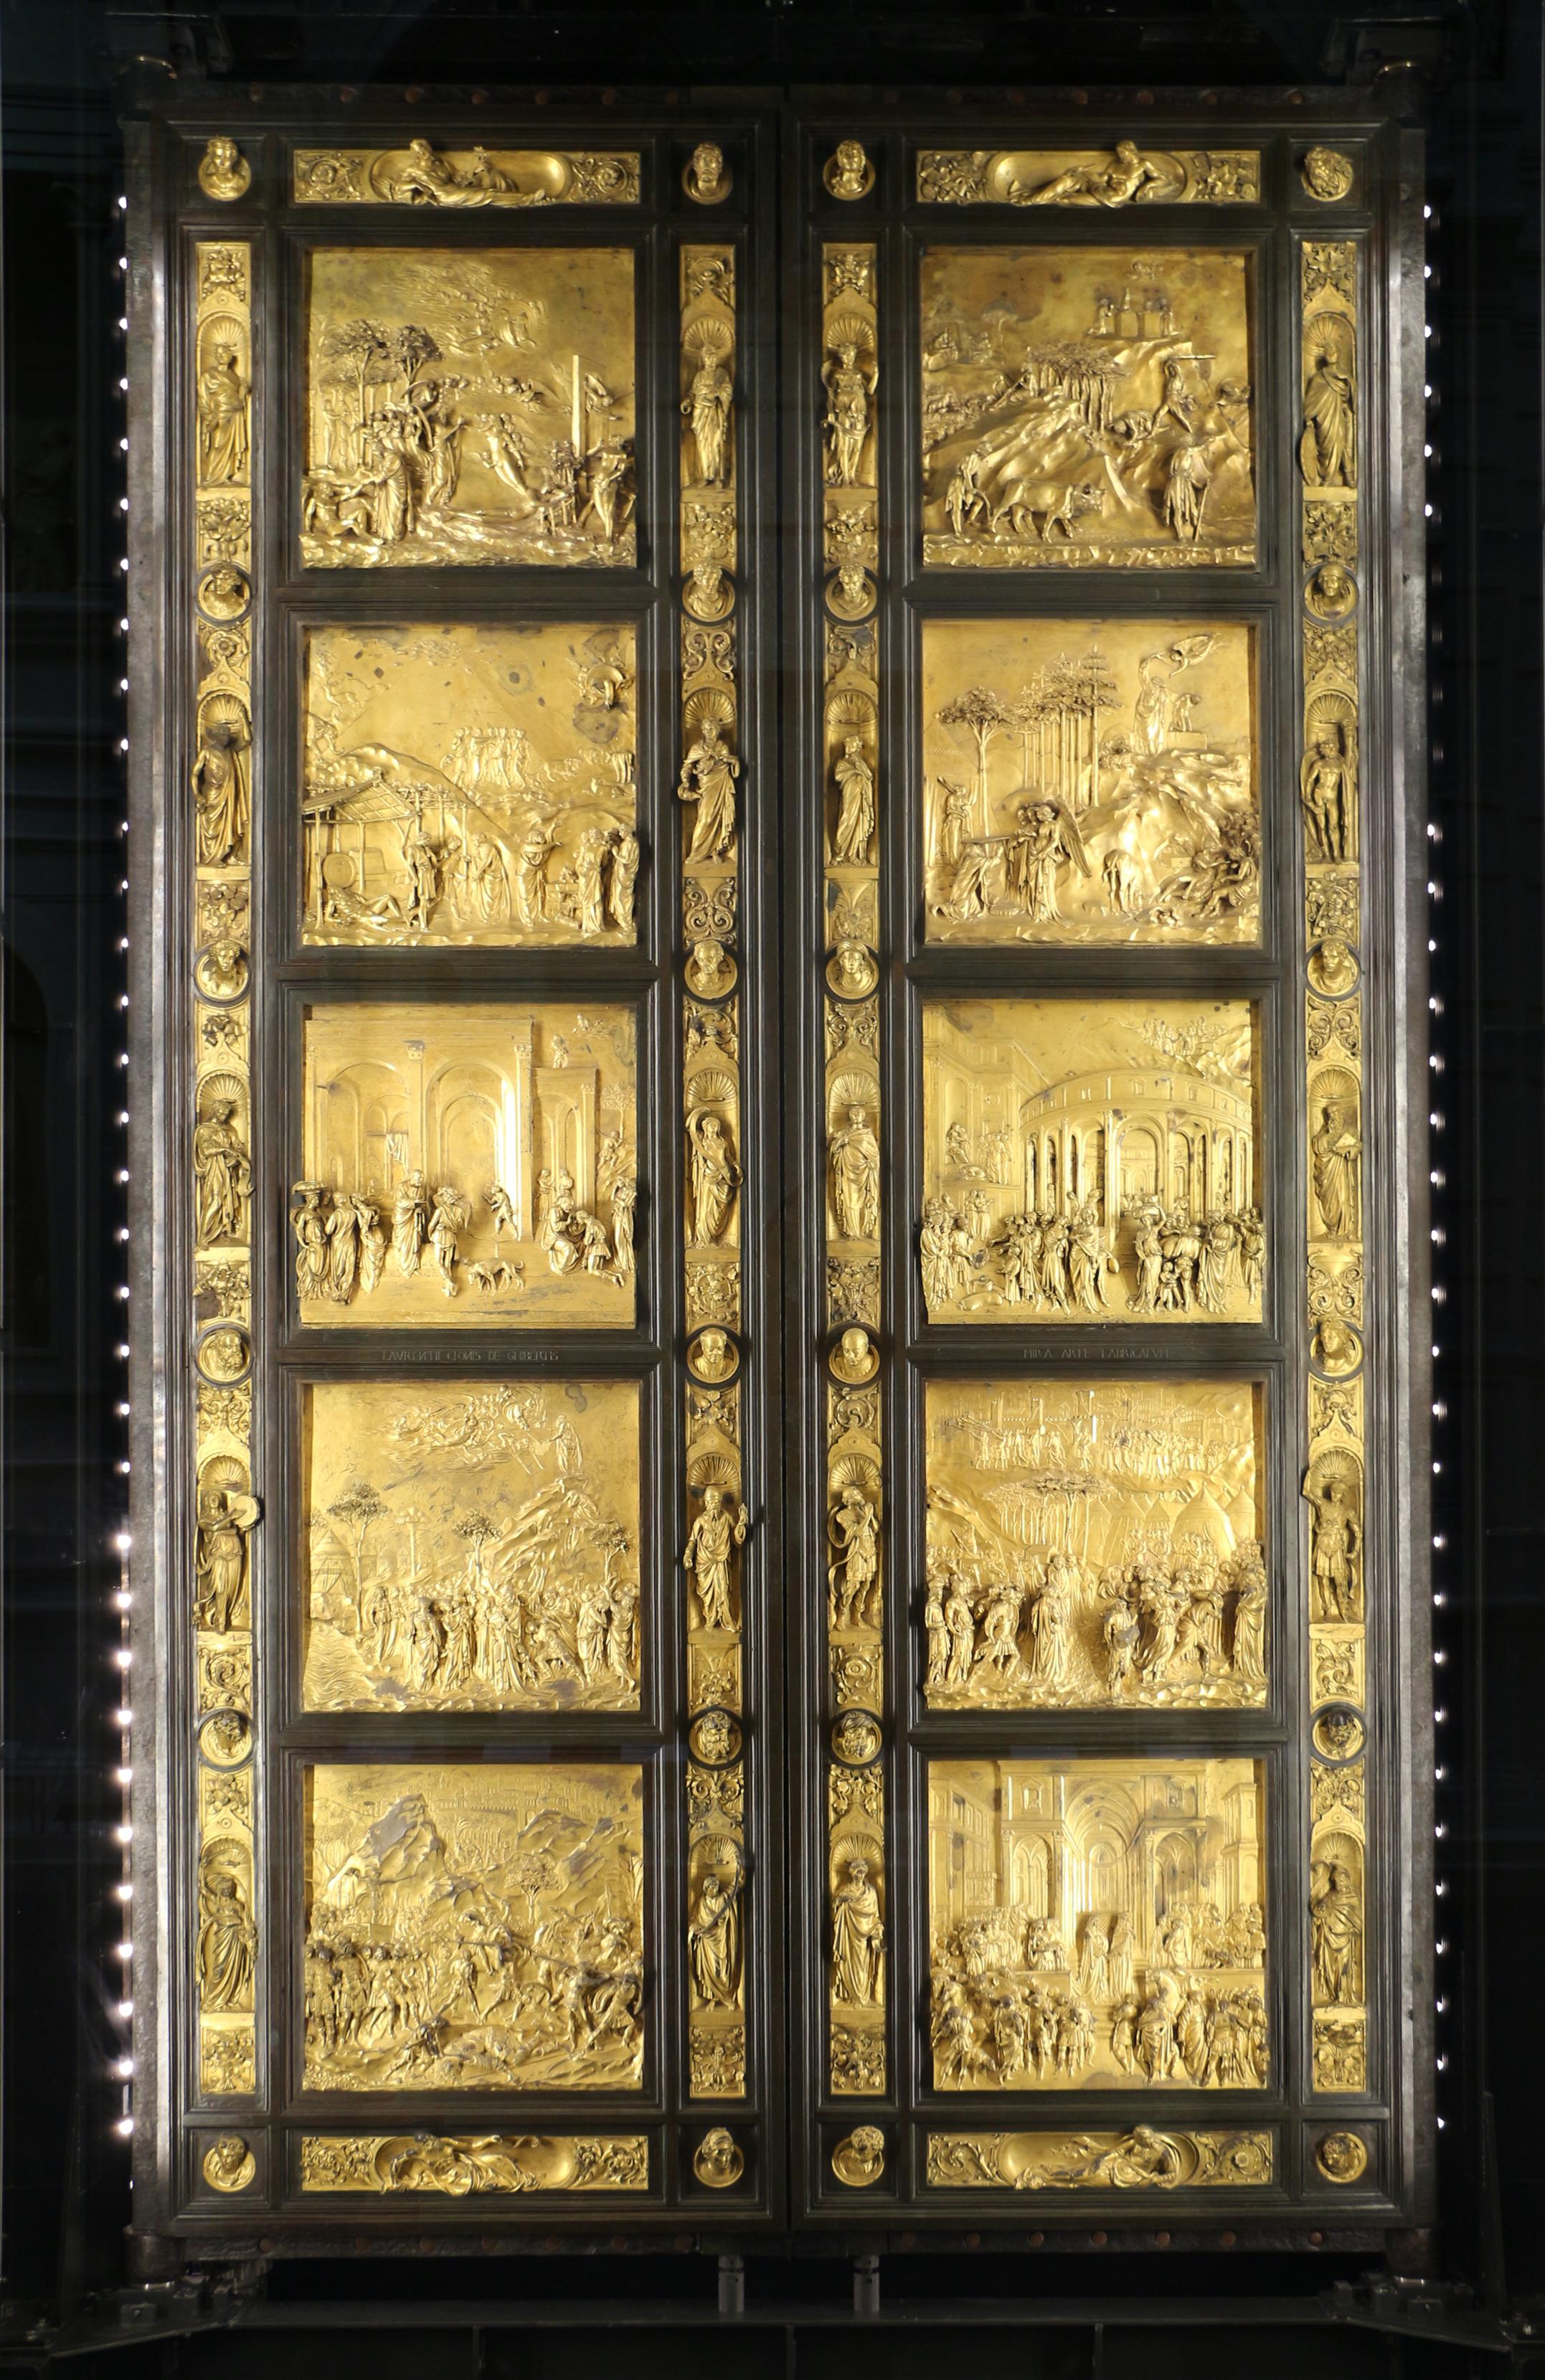 Door of the Paradise 1425 - 1452 - Ghiberti & Door of the Paradise 1425 - 1452 - Ghiberti - WikiArt.org